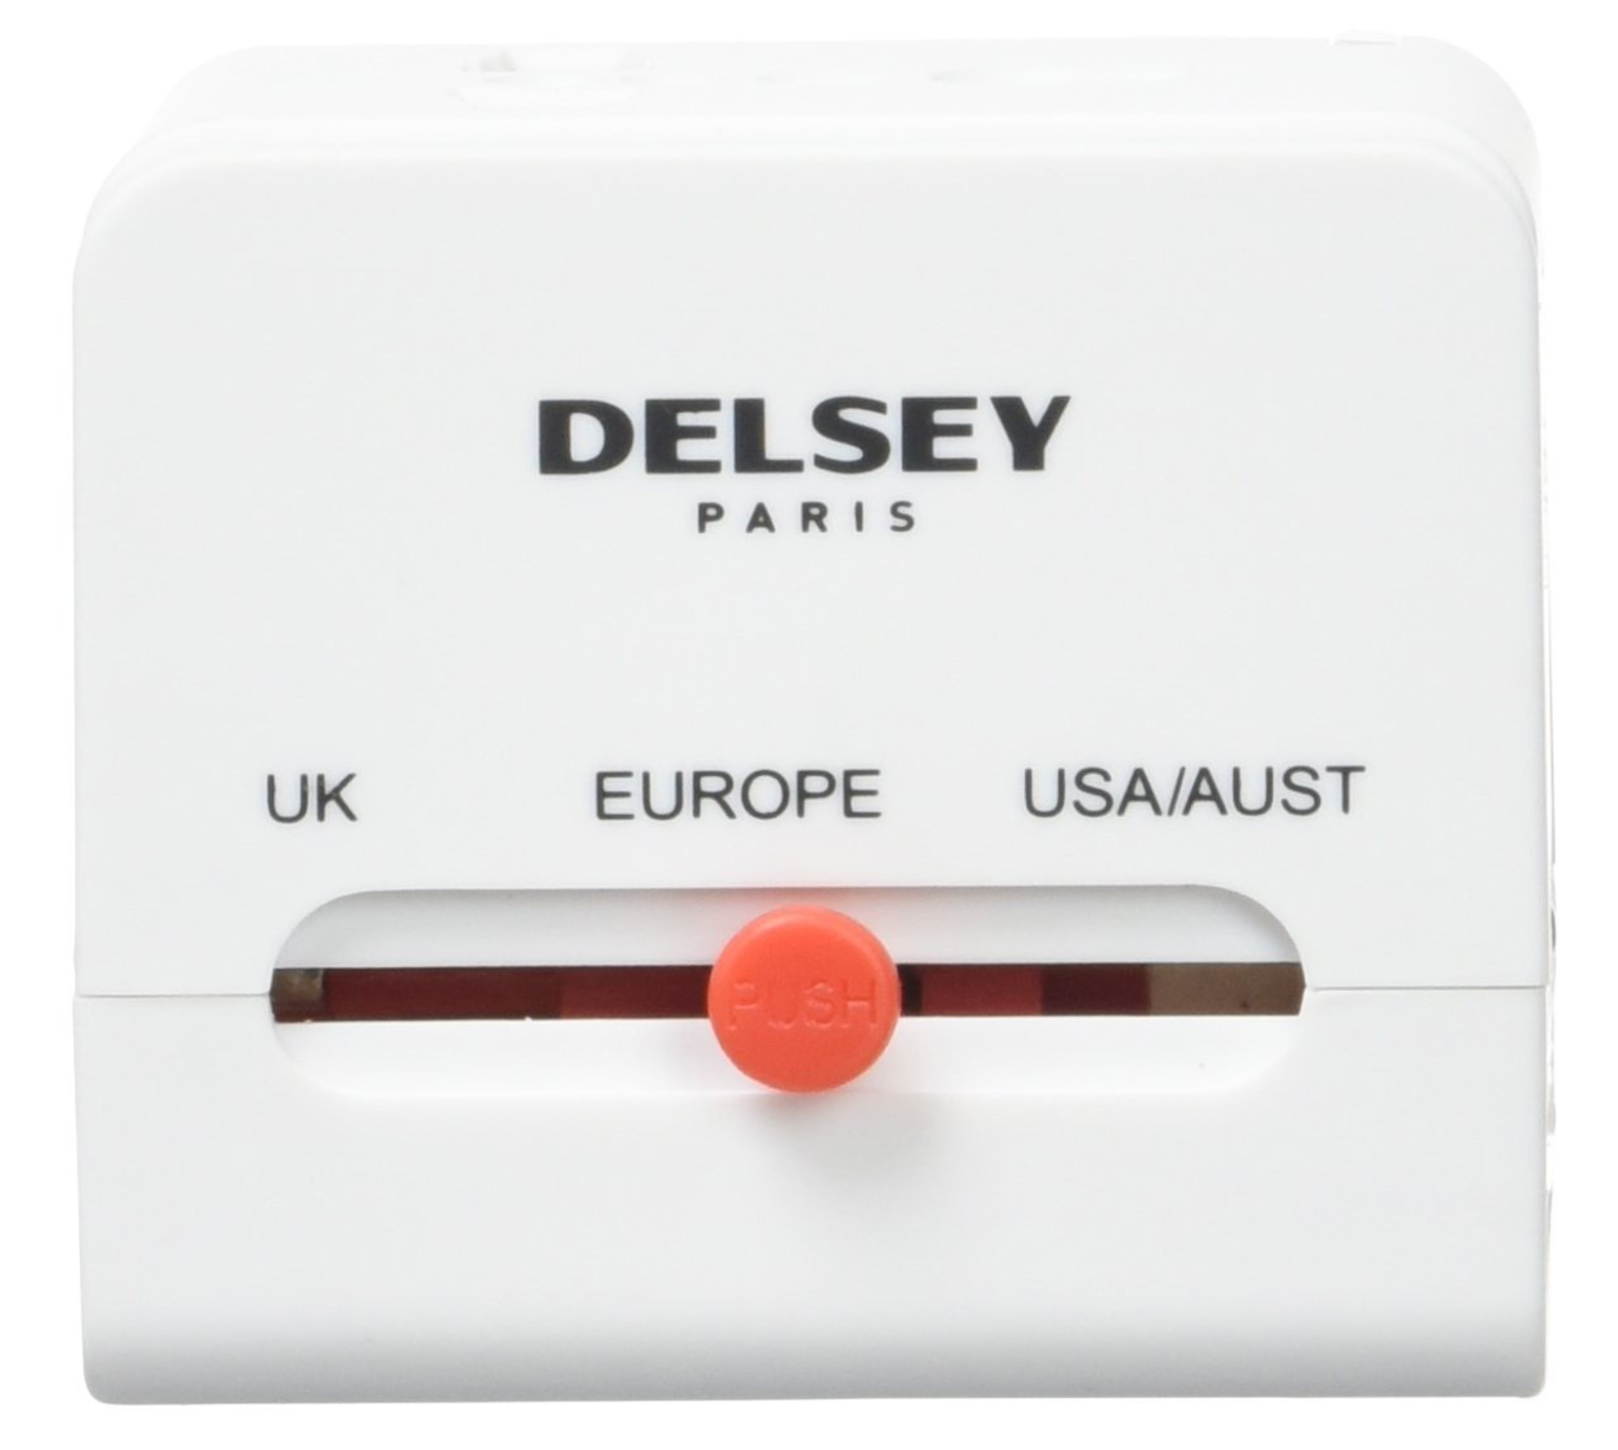 DELSEY PLUG IT ADAPTATEUR UNIVERSEL AVEC 2 PORTS USB(UK/EUROPE/USA-AUST)